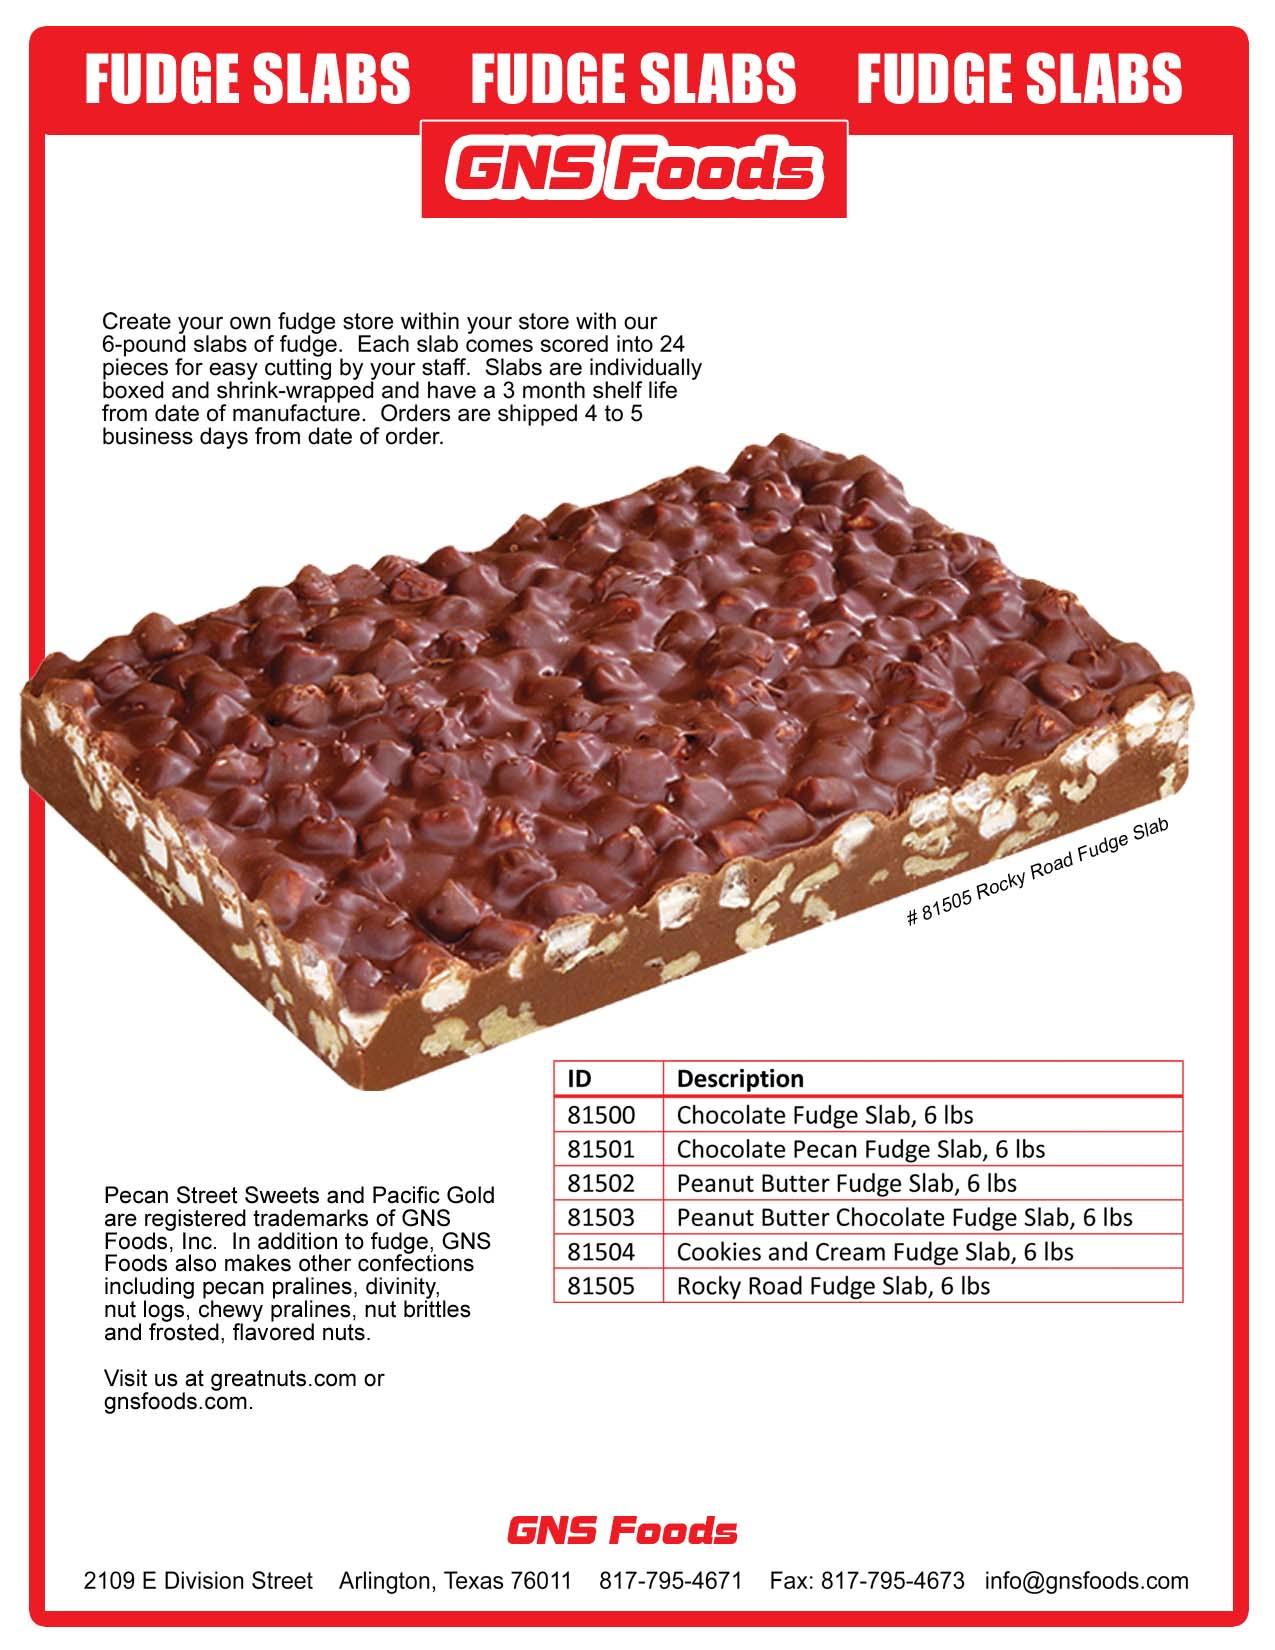 fudge-brochure-p-4-low-res-copy.jpg